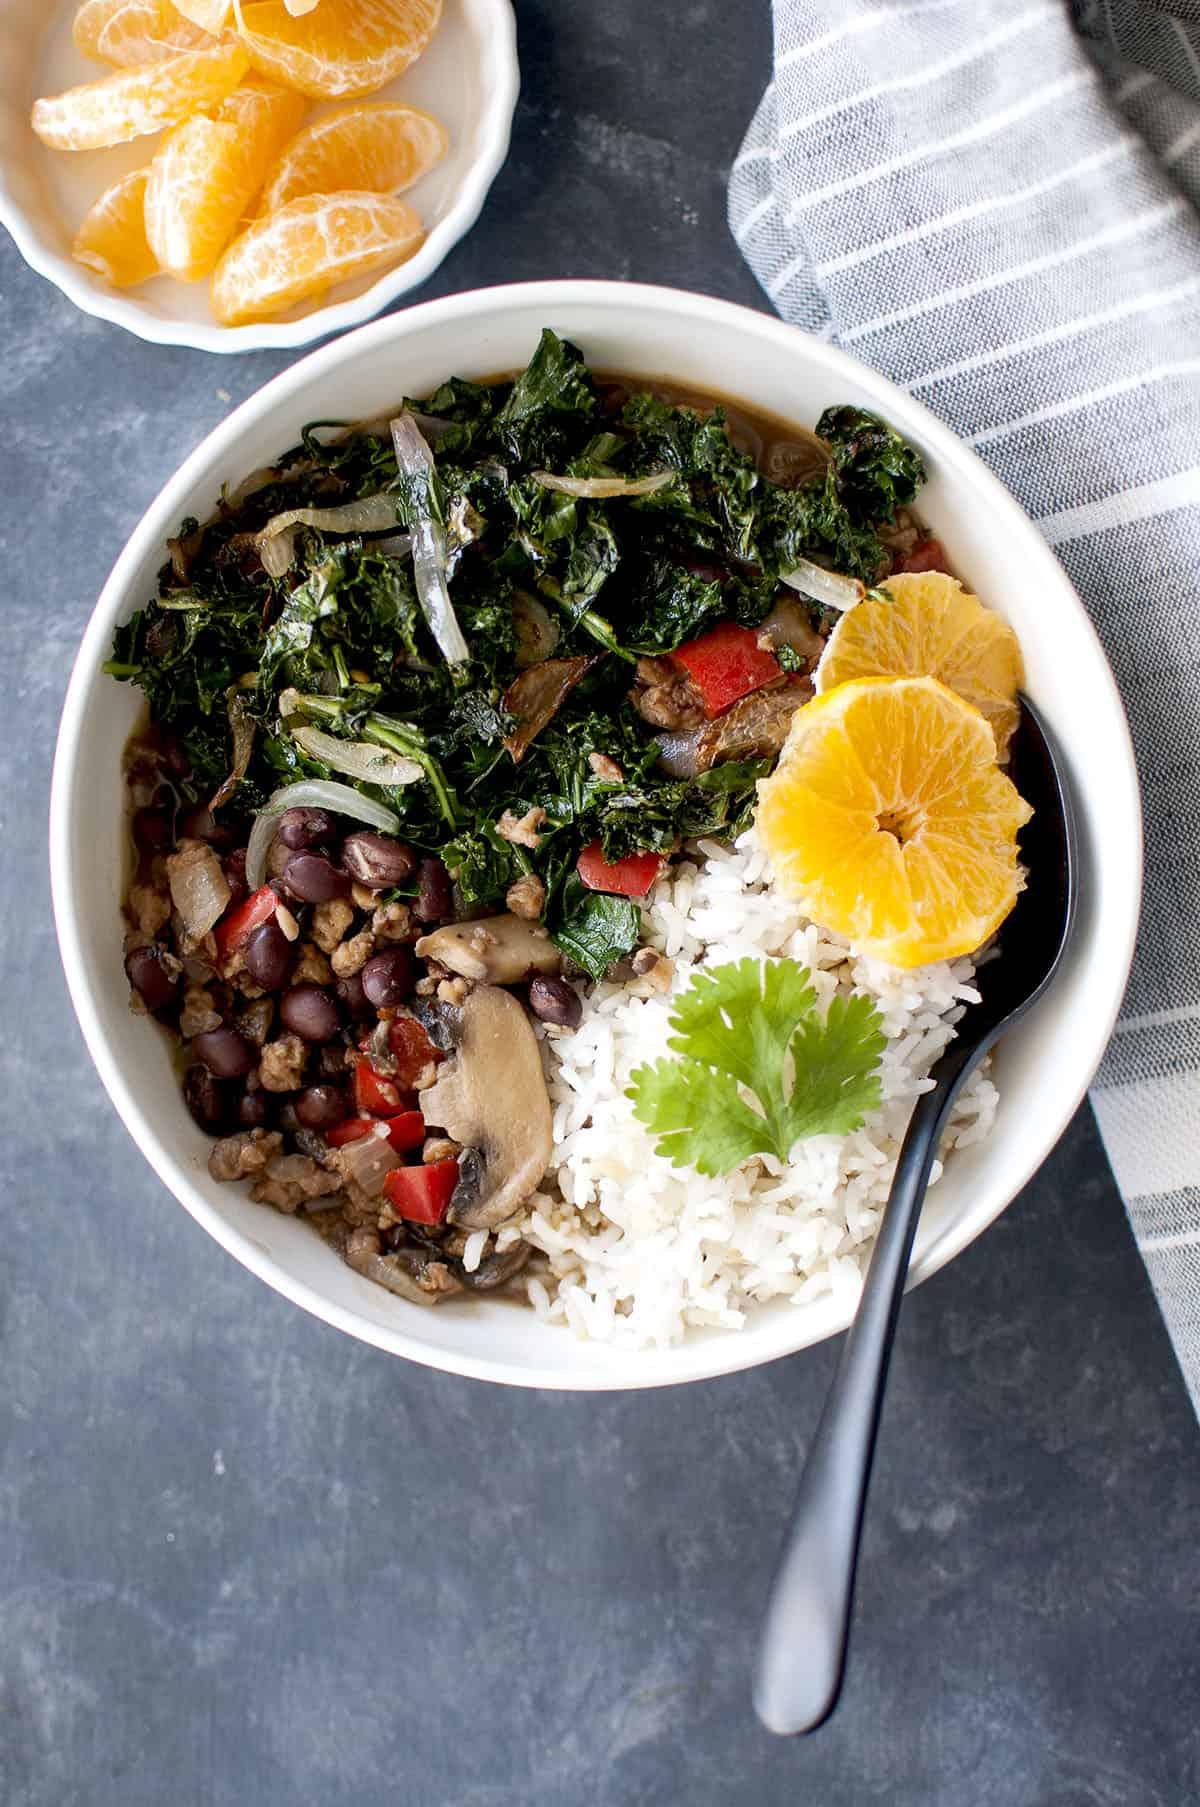 White bowl with Vegan Feijoada served with white rice and orange segments